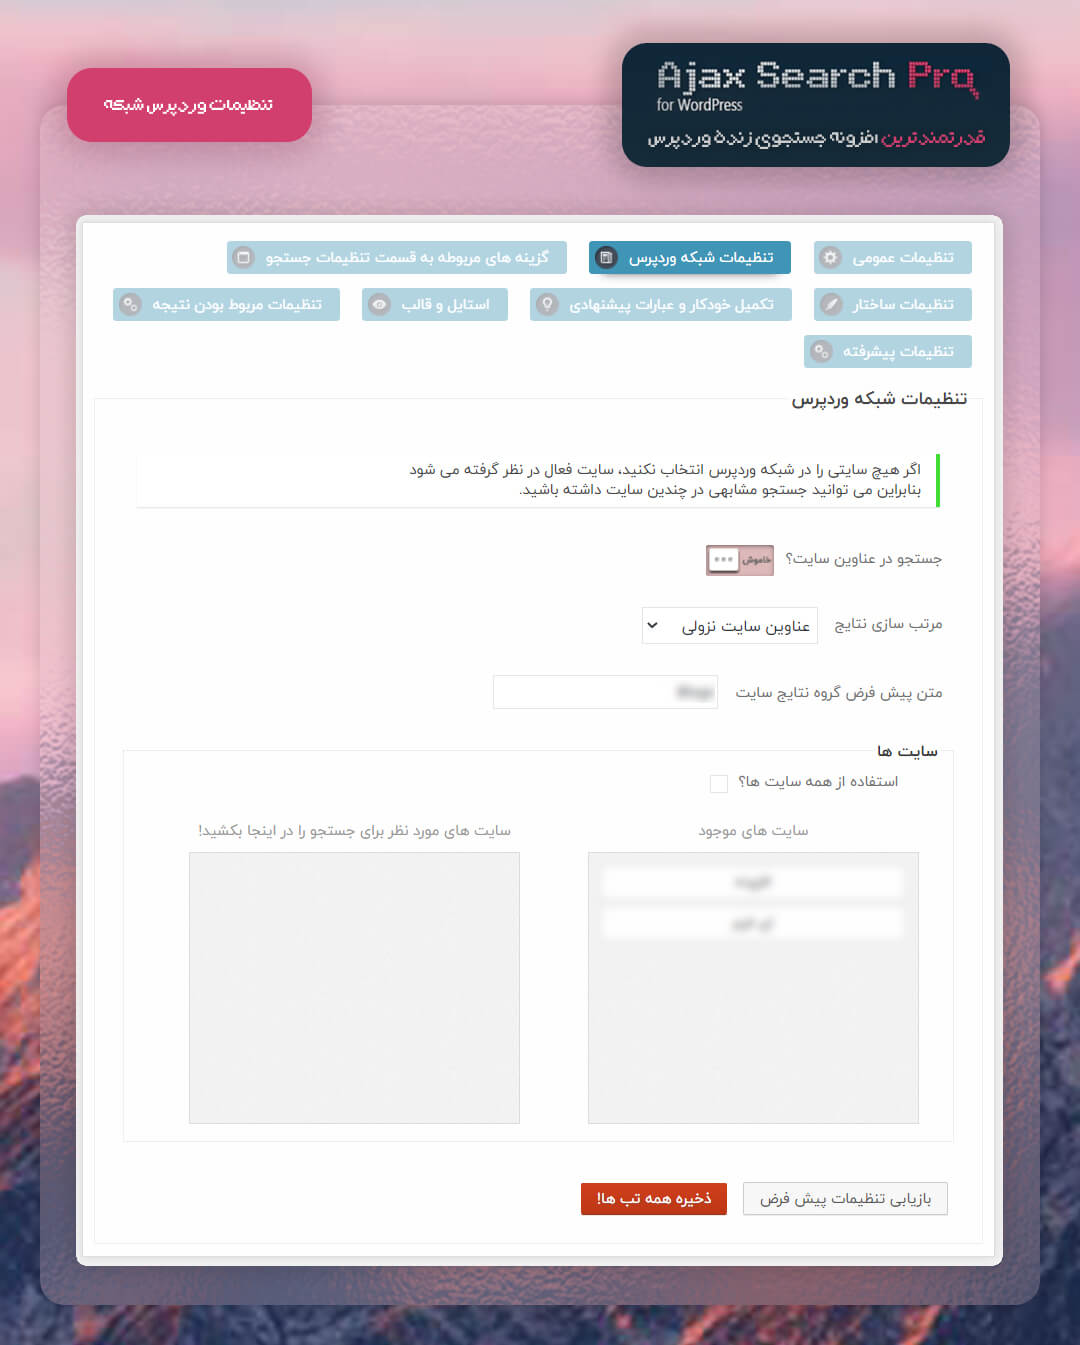 تنظیمات شبکه پلاگین جستجوی پیشرفته Ajax Search Pro